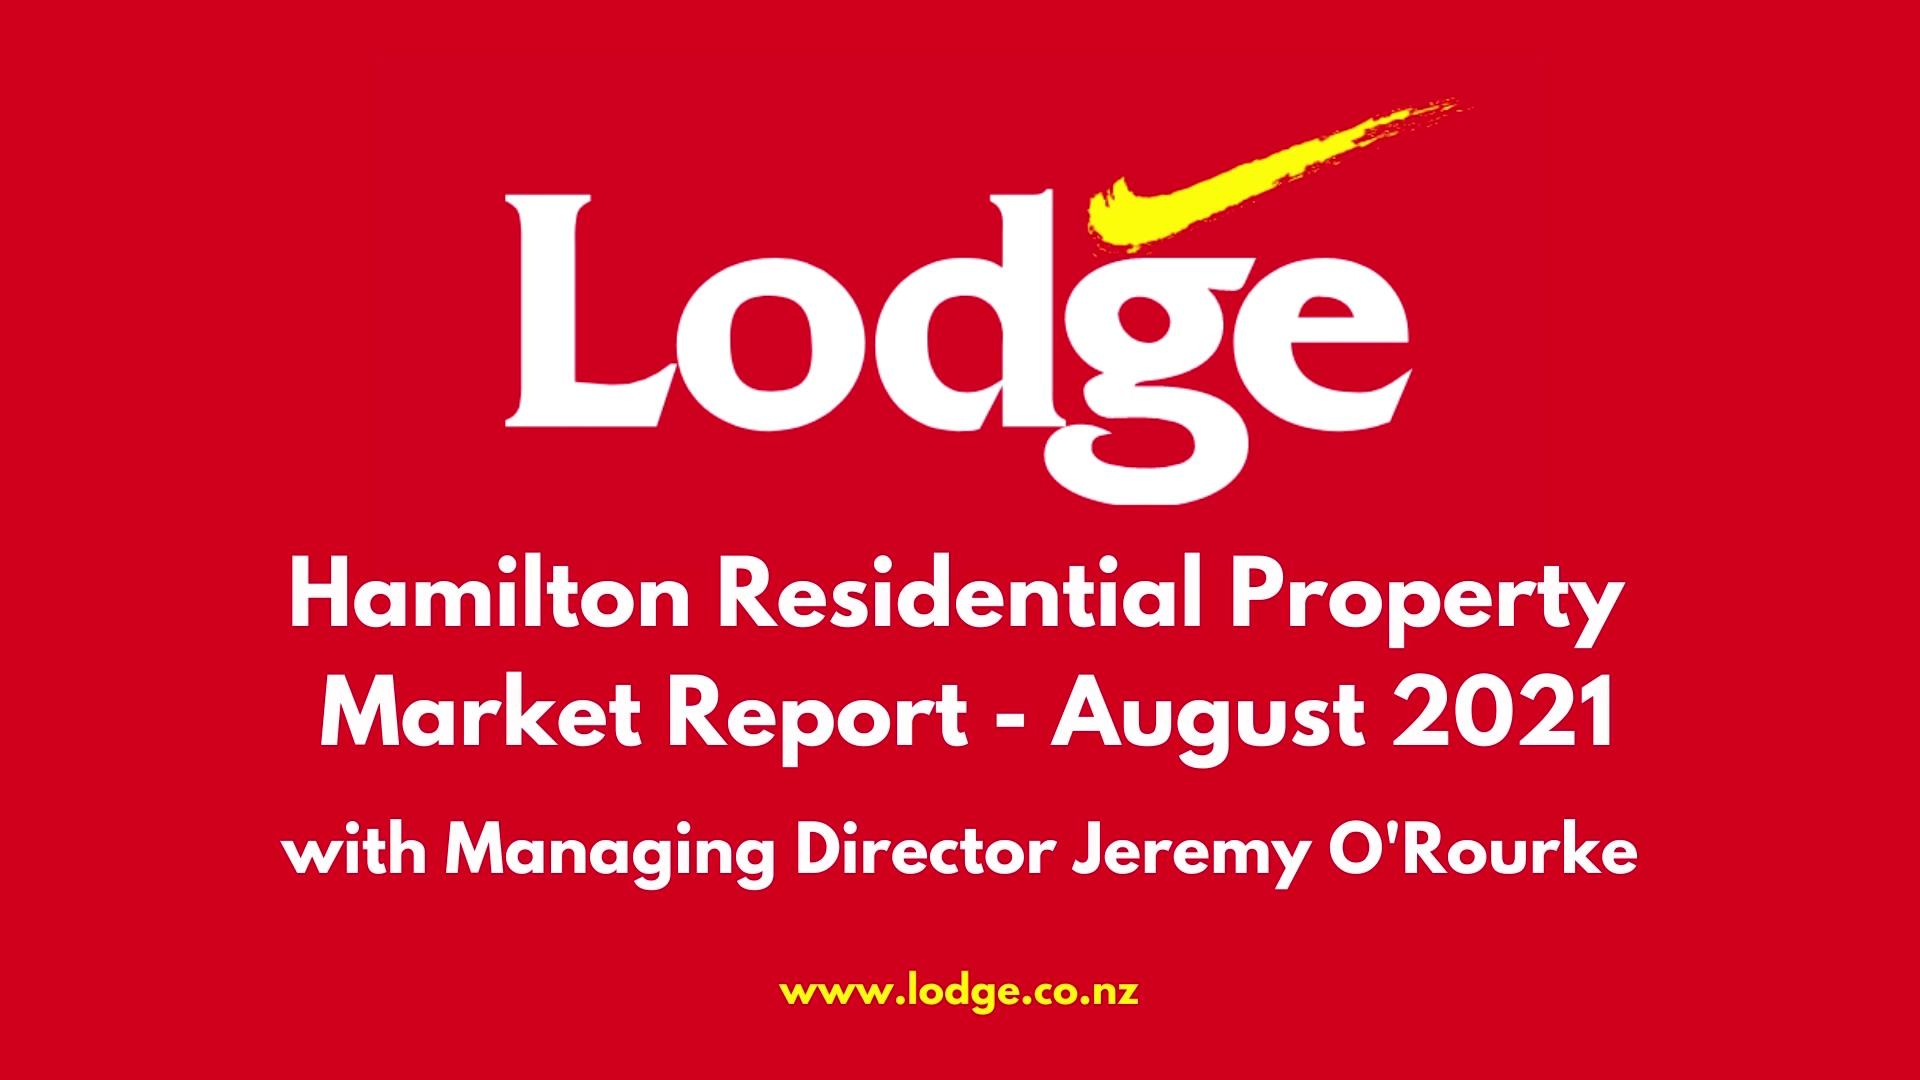 Lodge market report Aug video v1